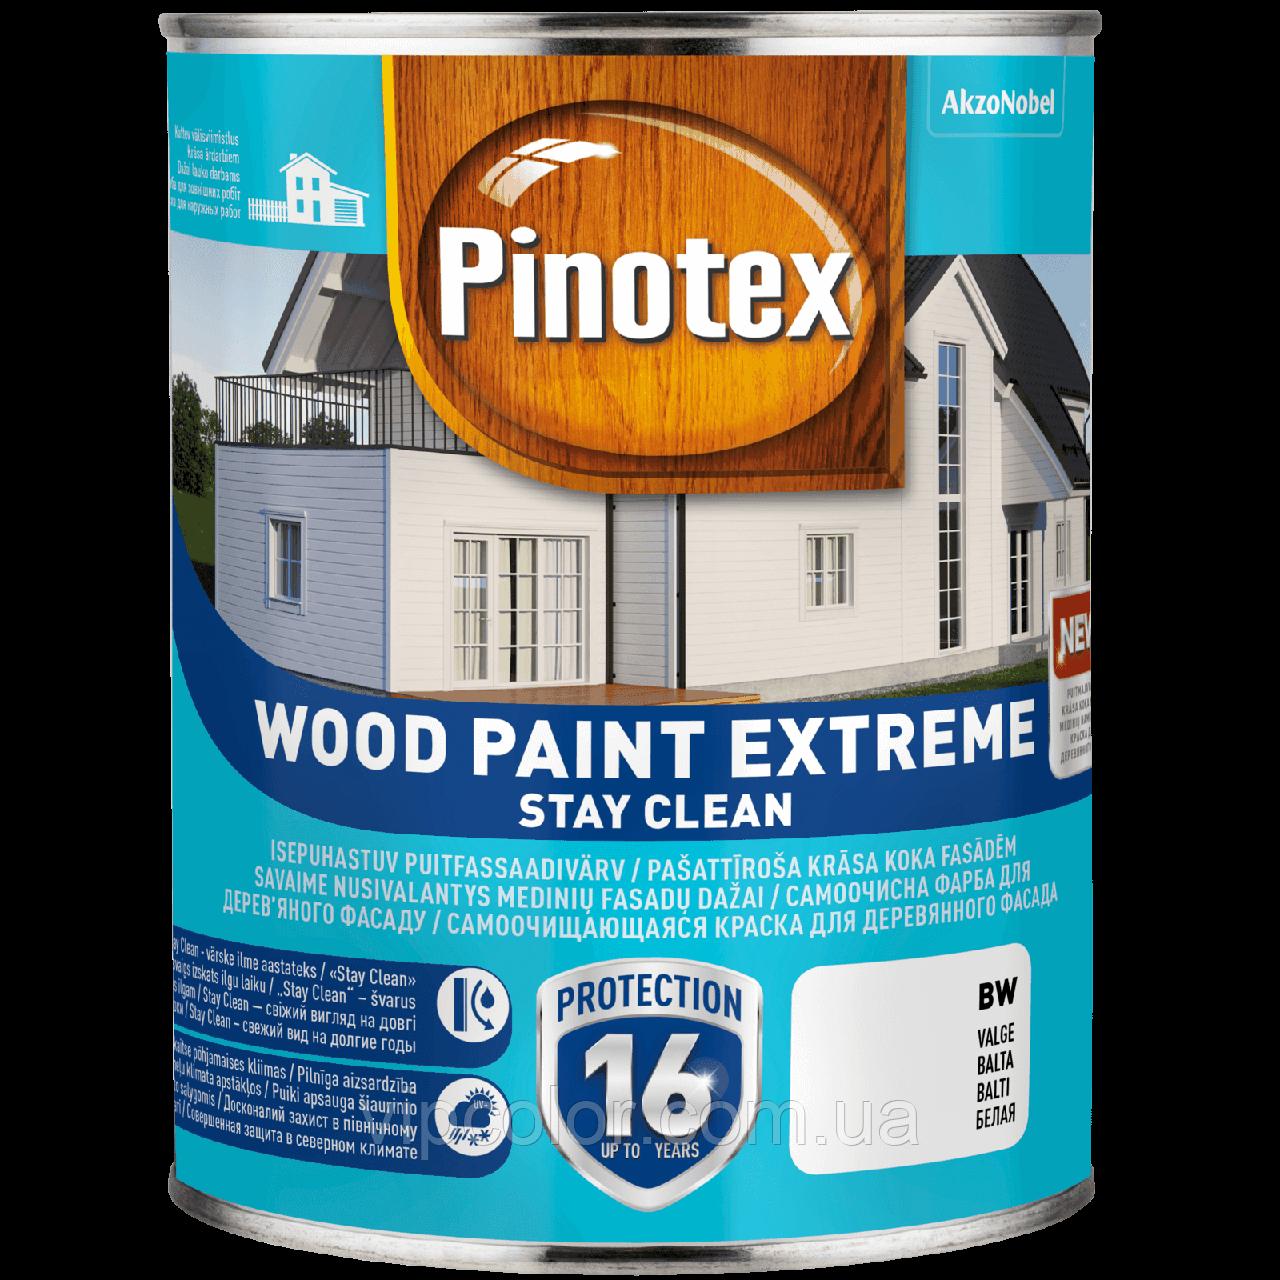 PINOTEX WOOD PAINT EXTREME тонир.база ВС 2,35л самоочищающаяся краска для наружных работ